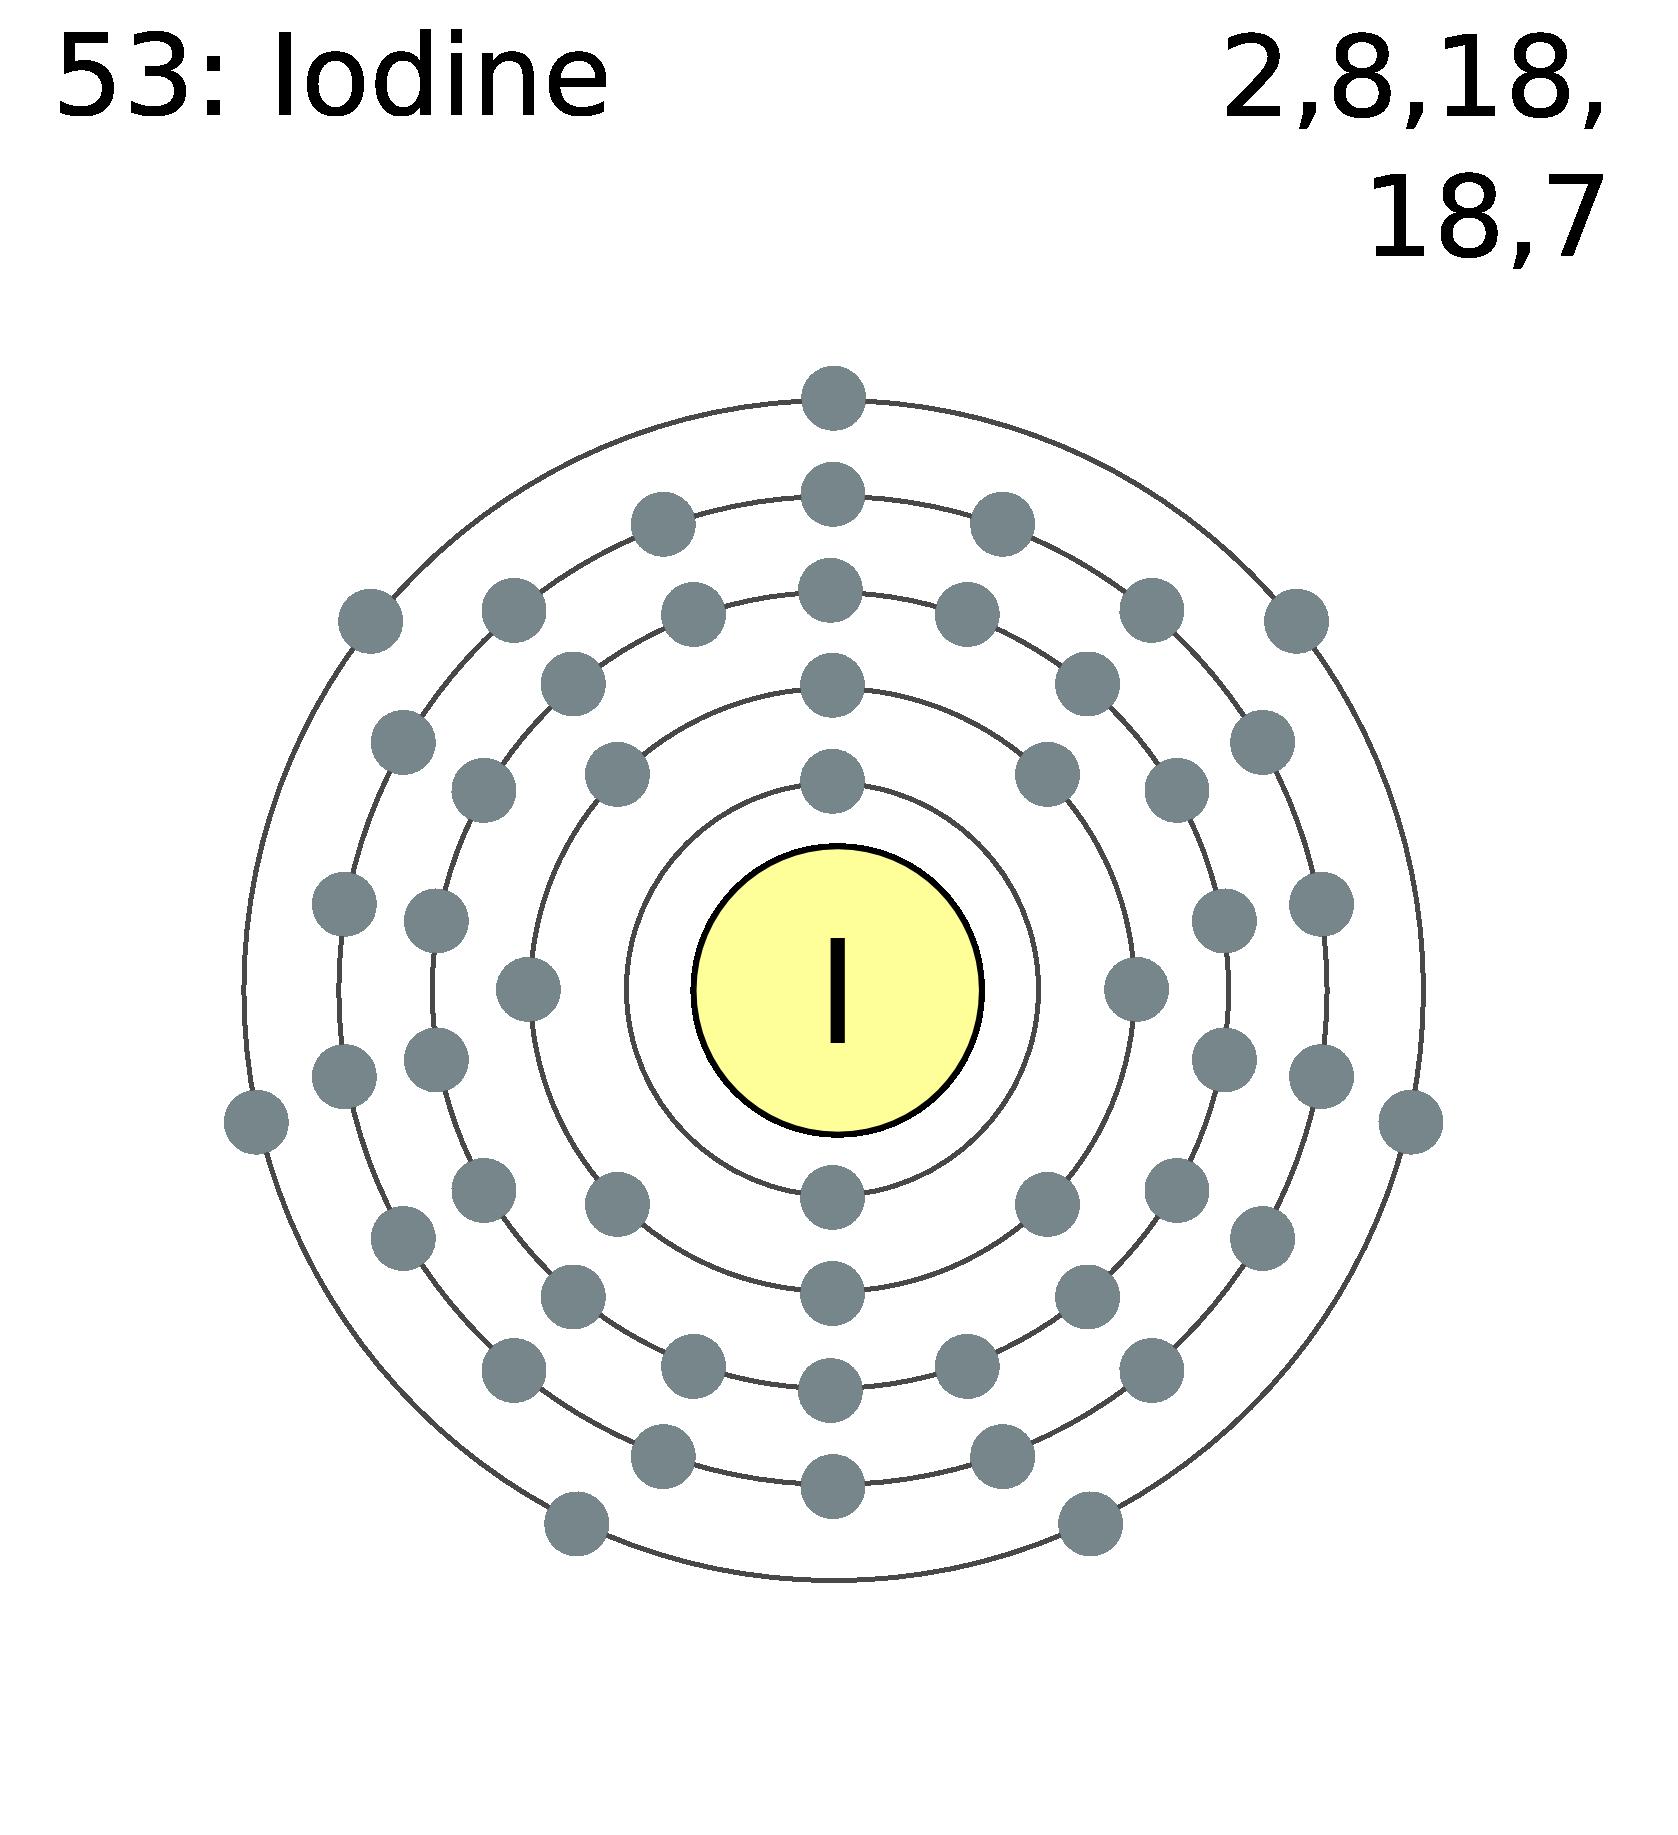 diagram of iodine online schematics wiring diagrams u2022 rh pushbots sender com Shell Model of Iodine How Does Iodine Look Like a Nickel